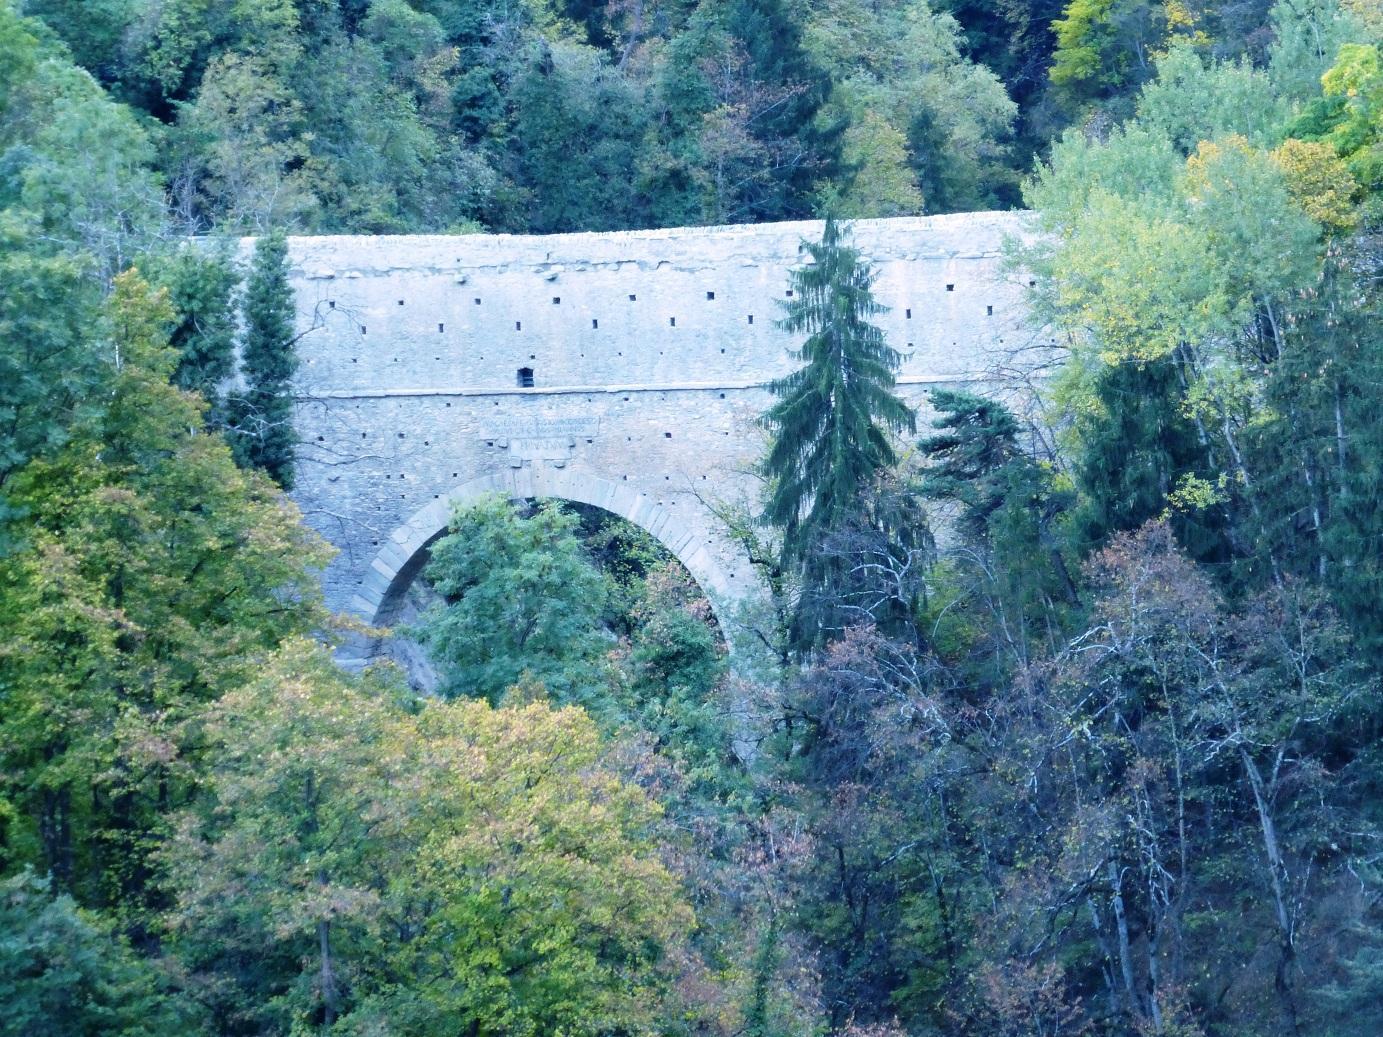 Poignon (Mont) da Villeneuve, giro per Petit Poignon e Pont d'Ael 2013-10-17